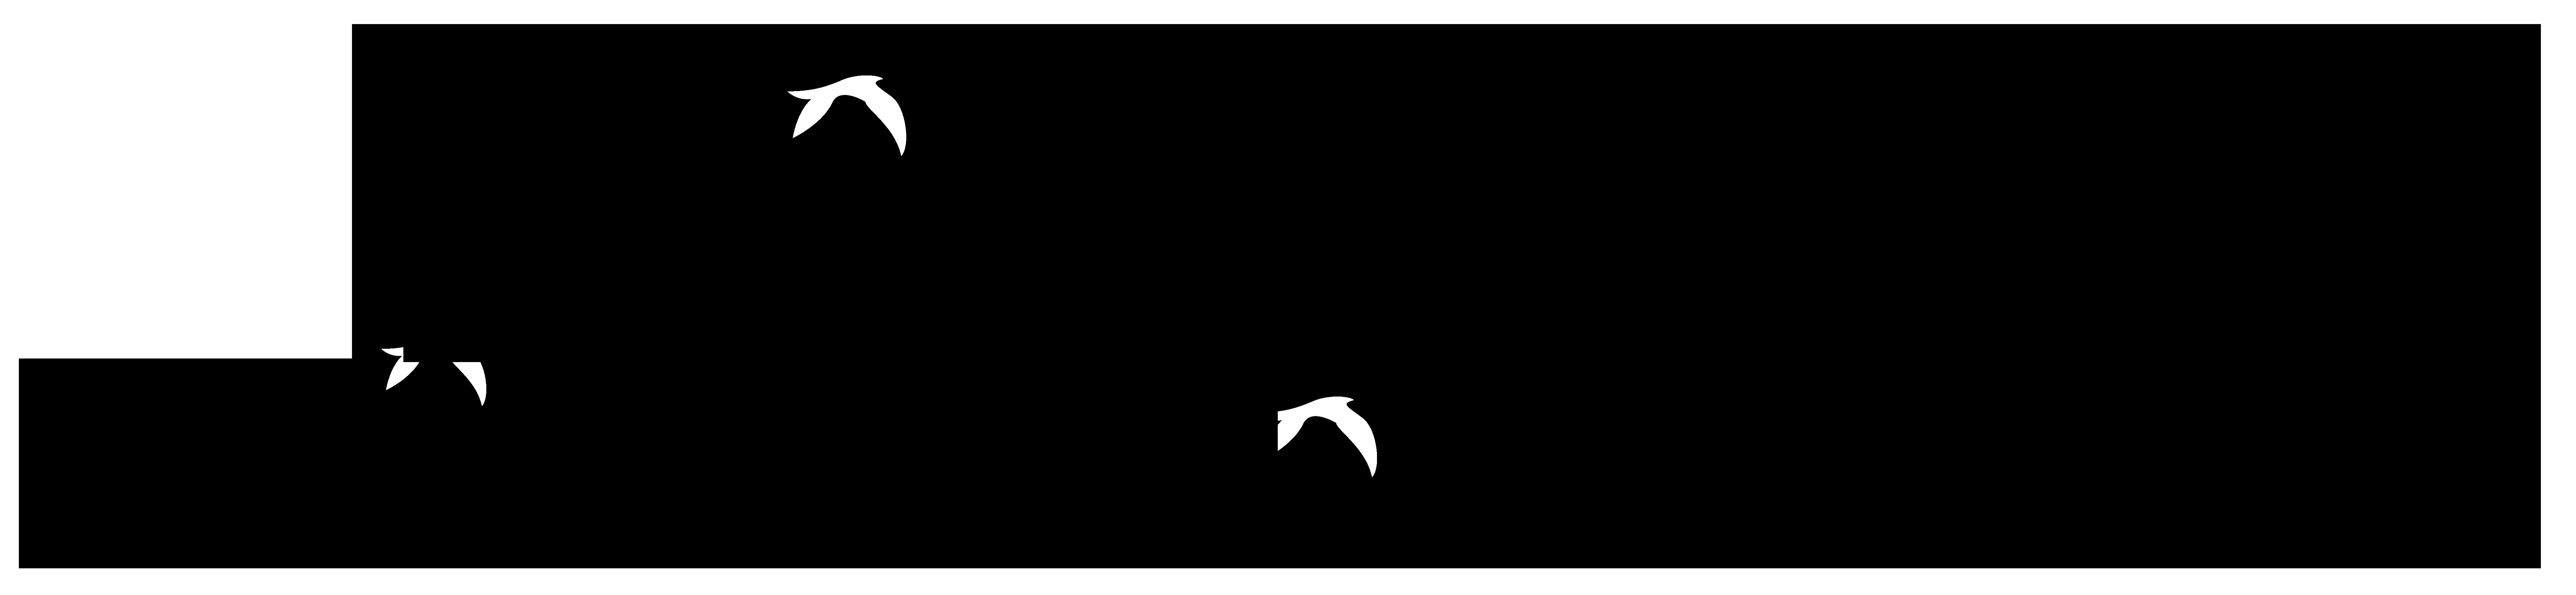 7919x1829 Free Love Bird Silhouette Clip Art